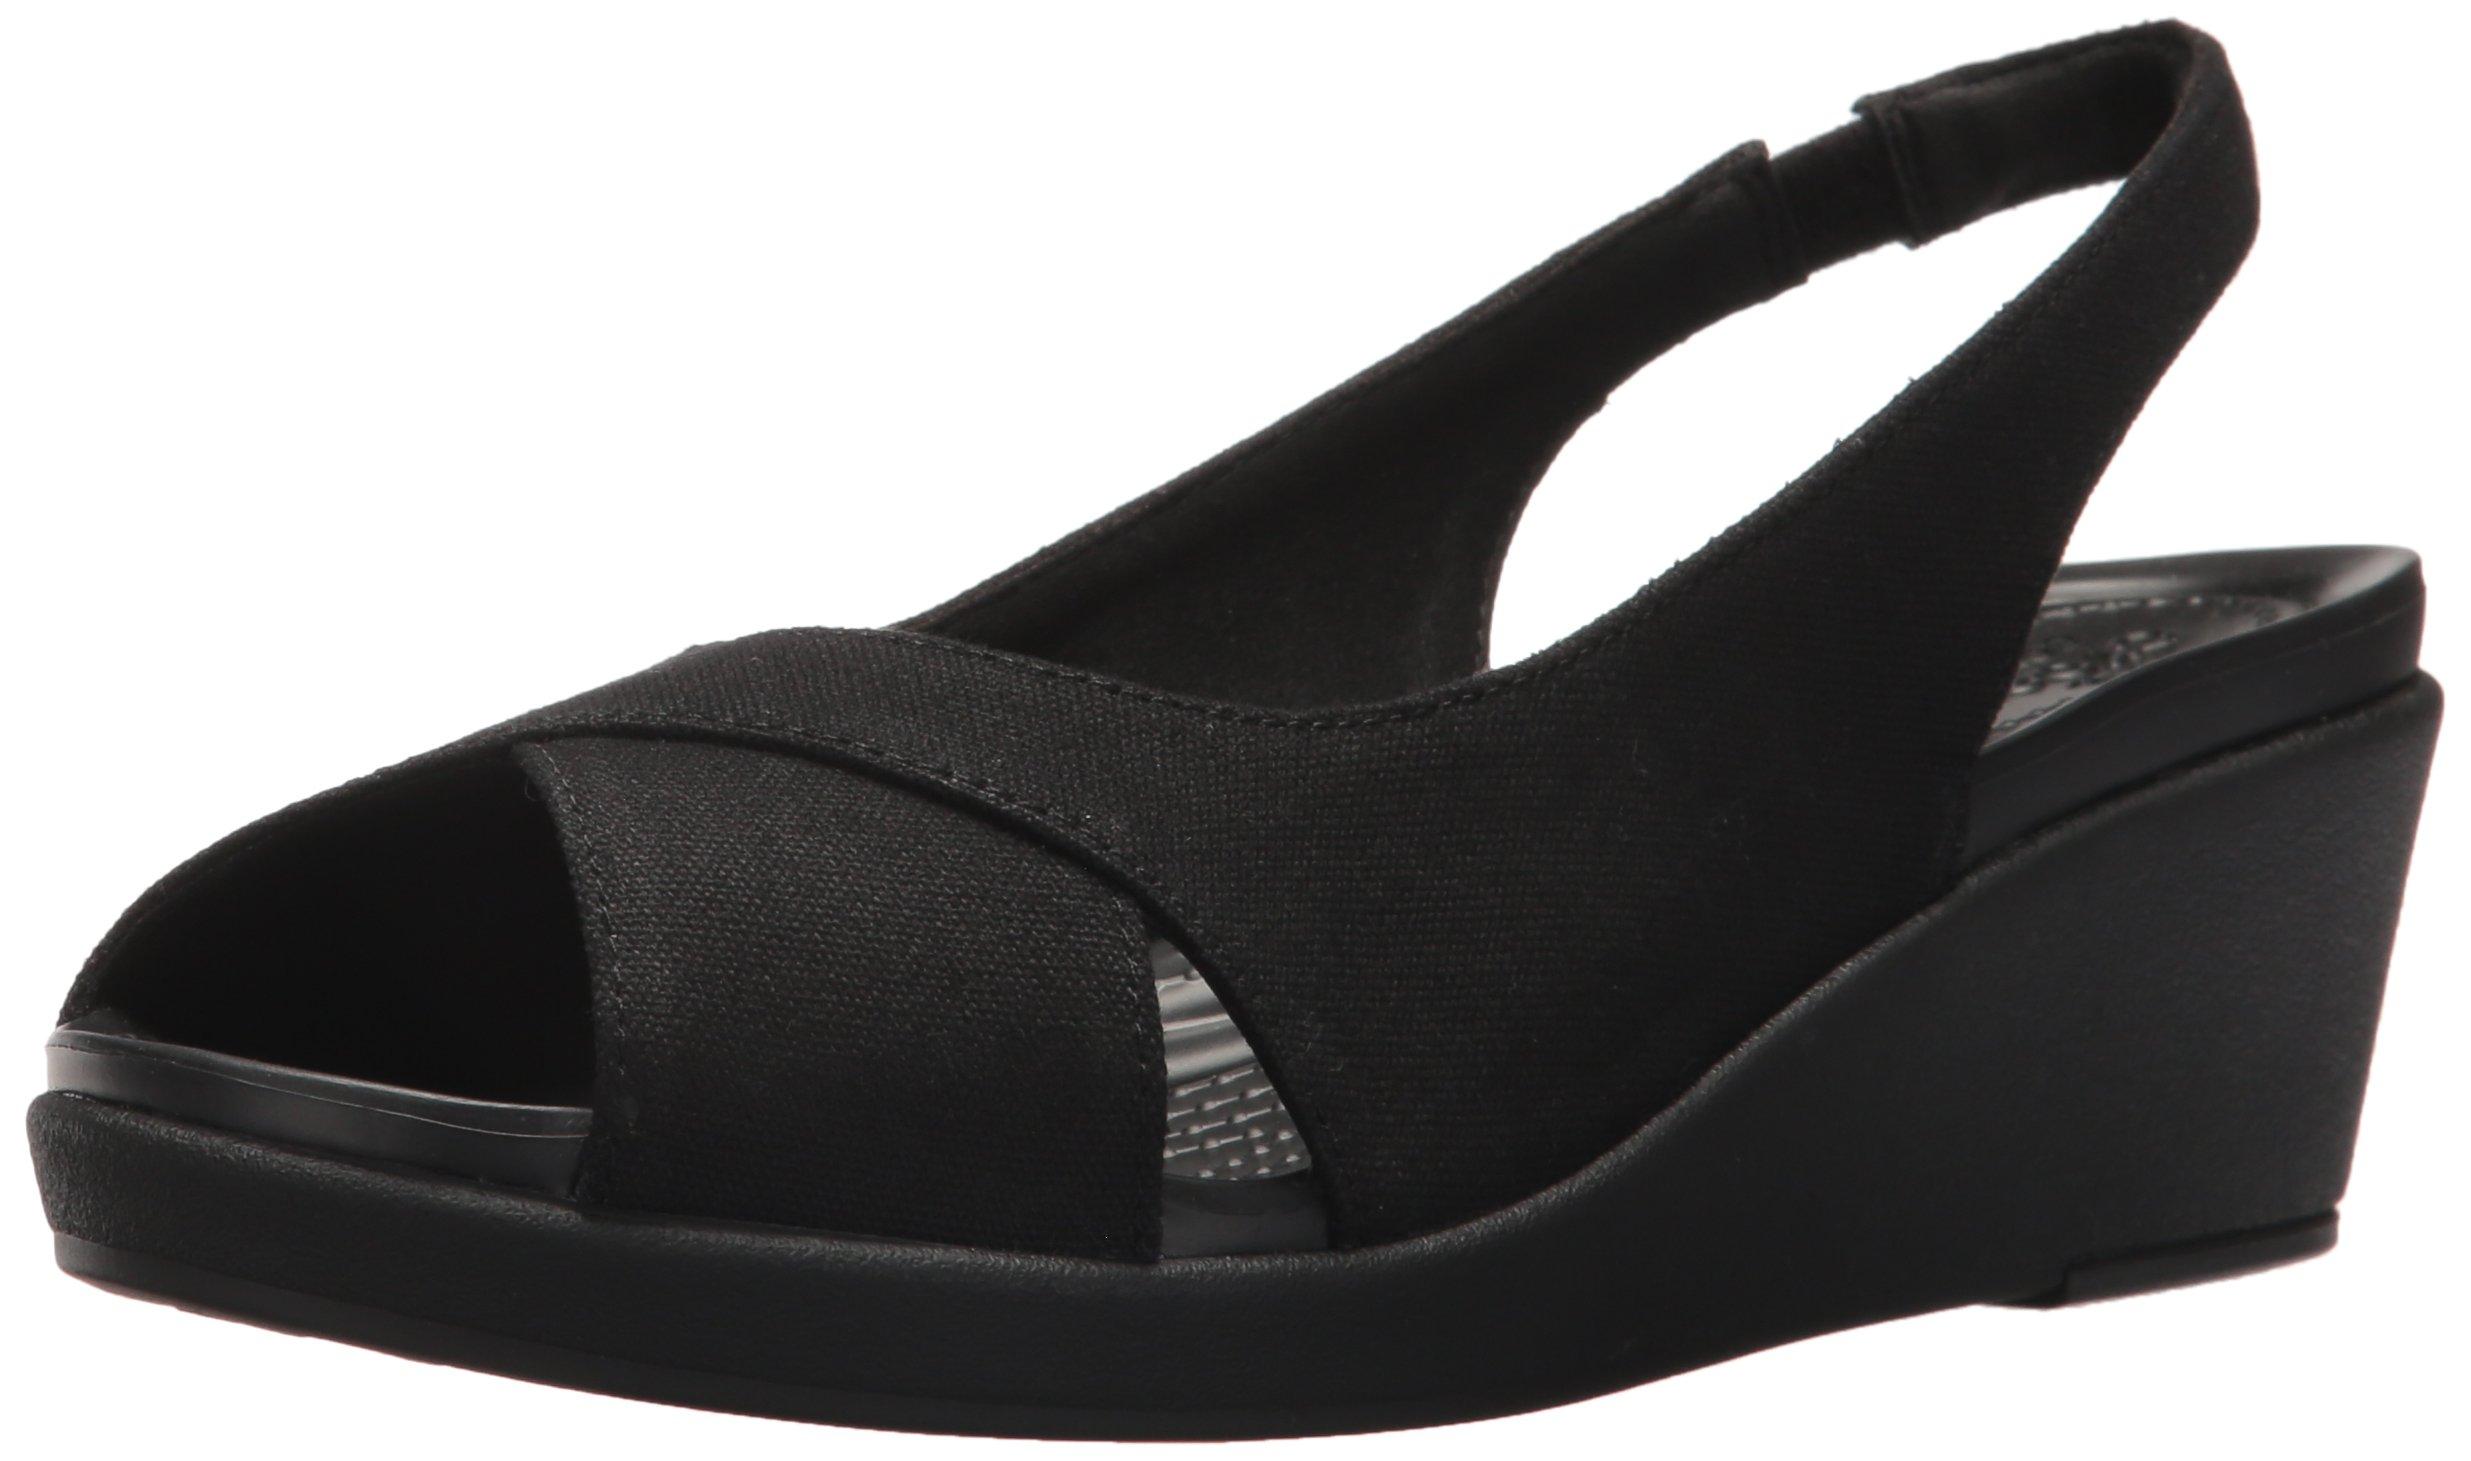 Crocs Women's Leigh Ann Slingback Wedge Sandal, Black, 8 M US by Crocs